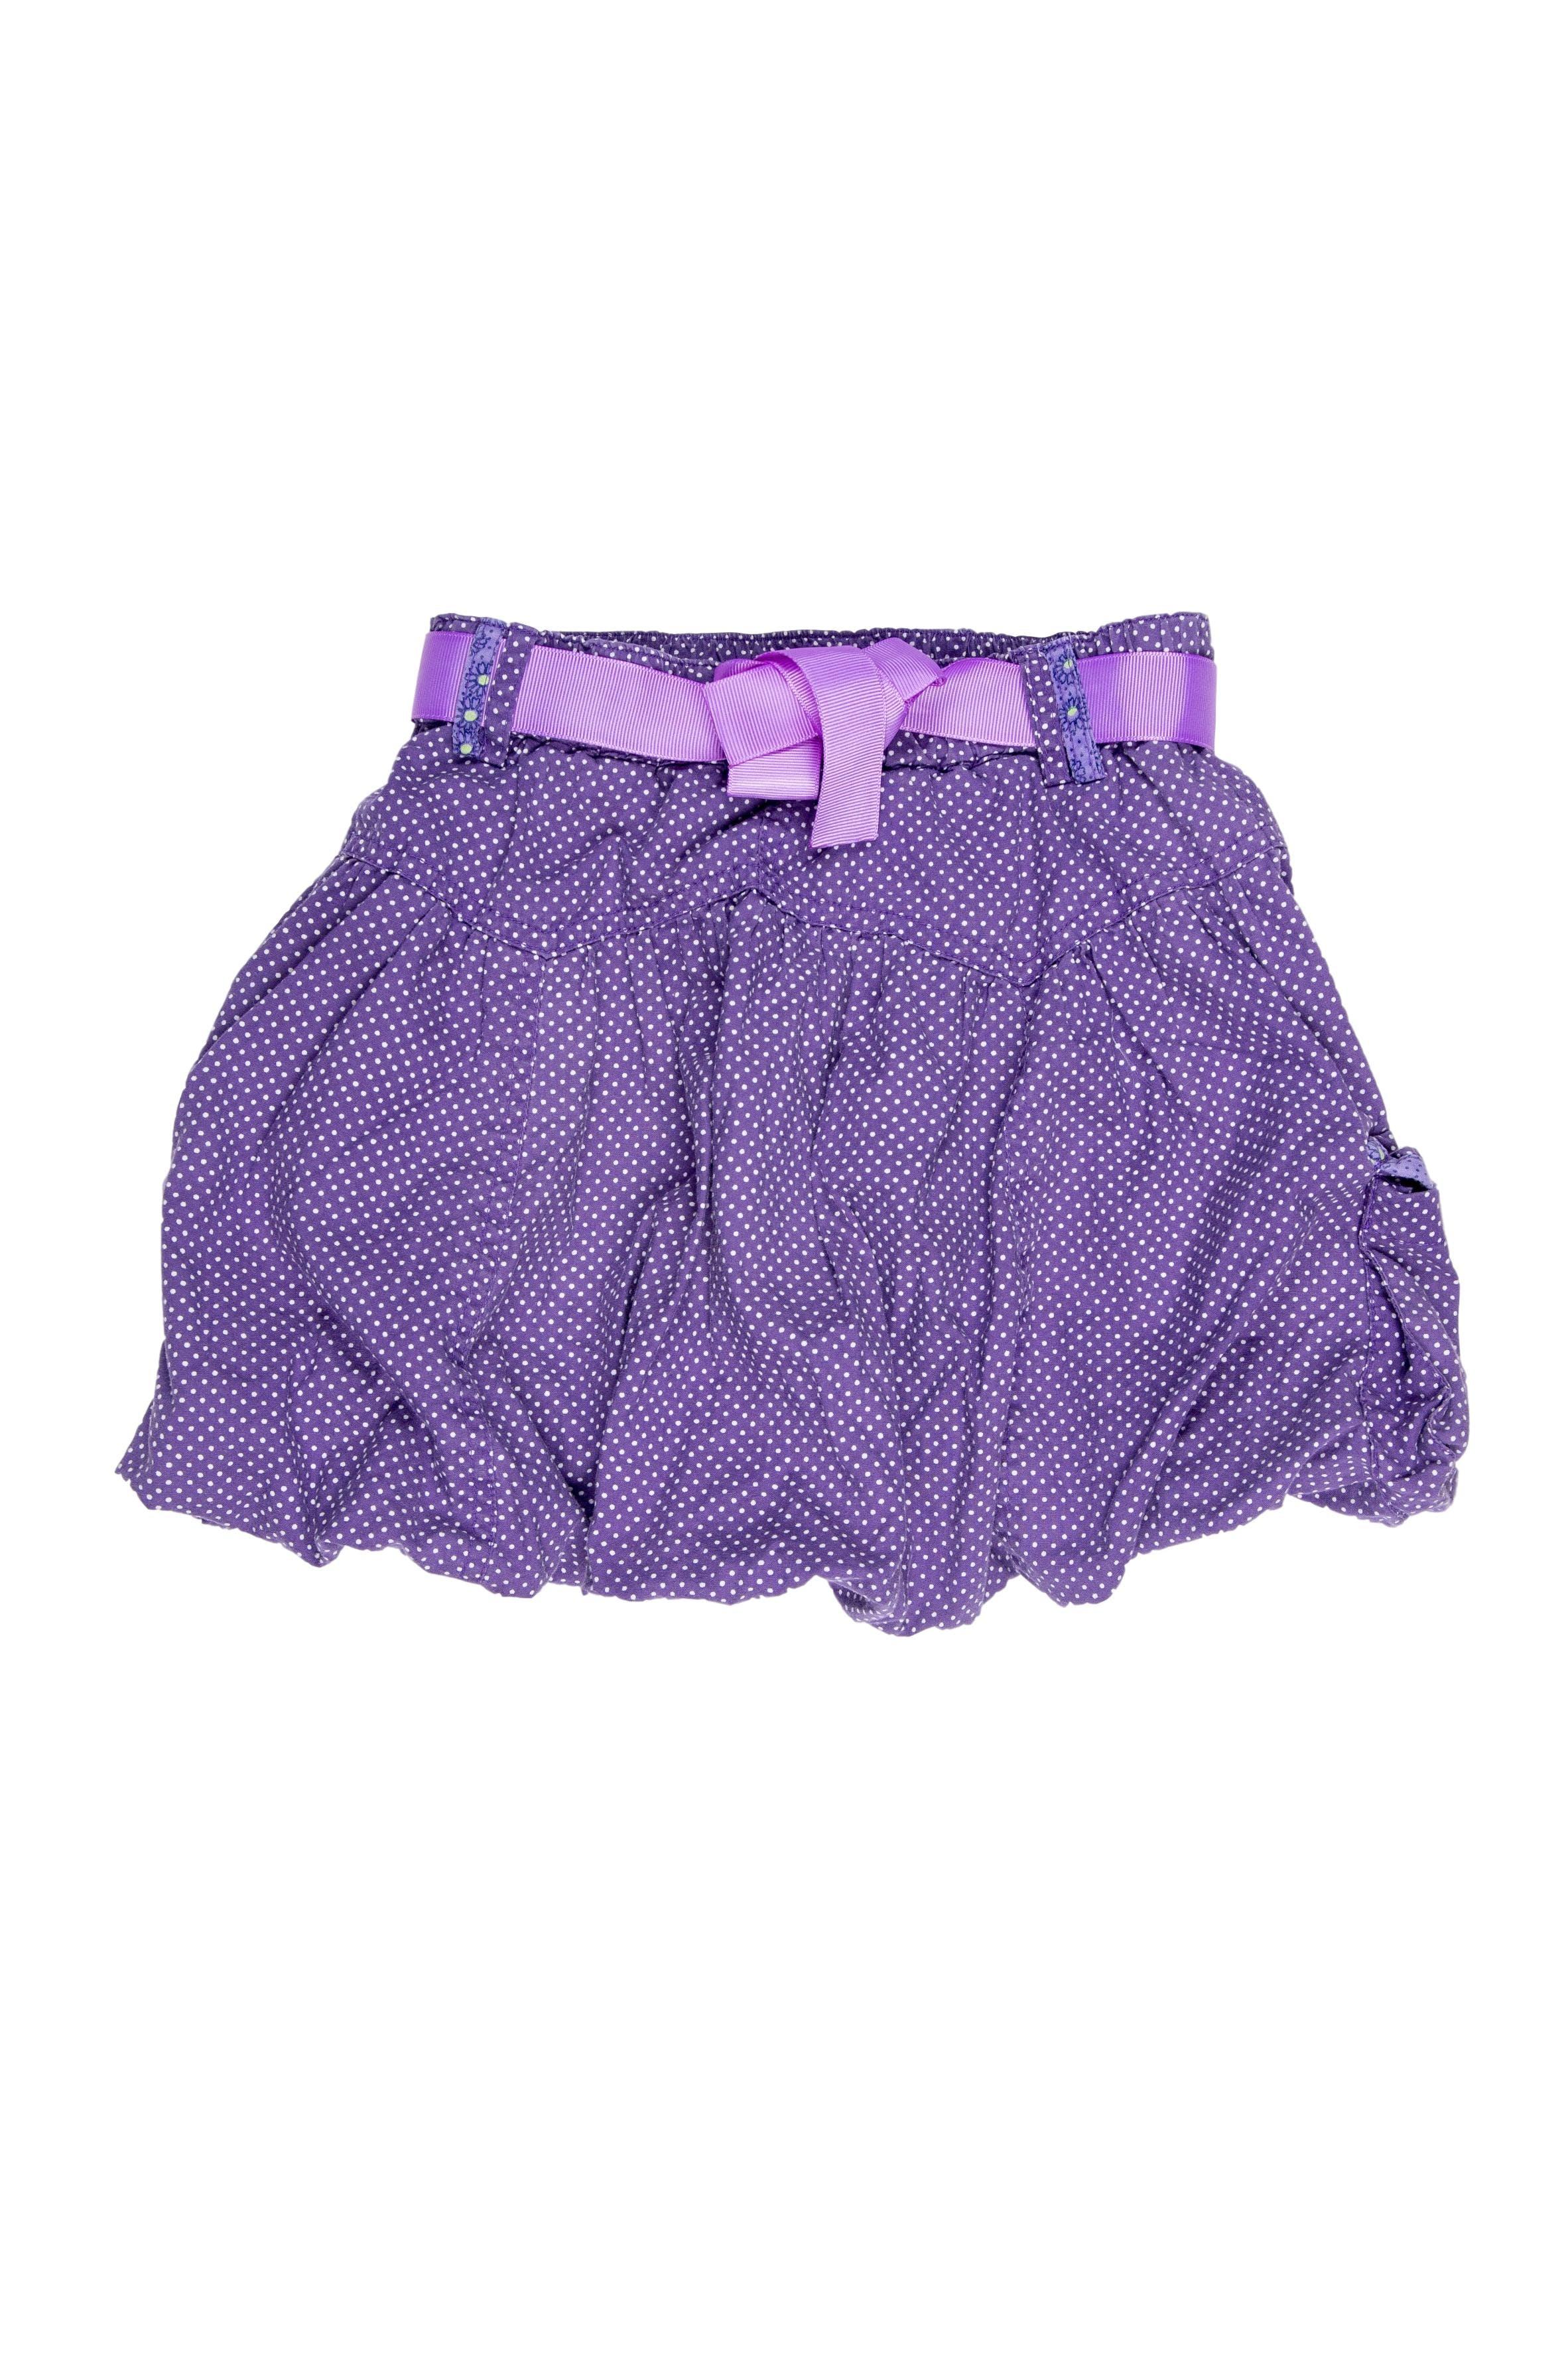 Falda morada globo con bolsilos 100% algodón, forrada. Talla en etiqueta 5T (110 europea). Precio original S/ 160 - Minymo